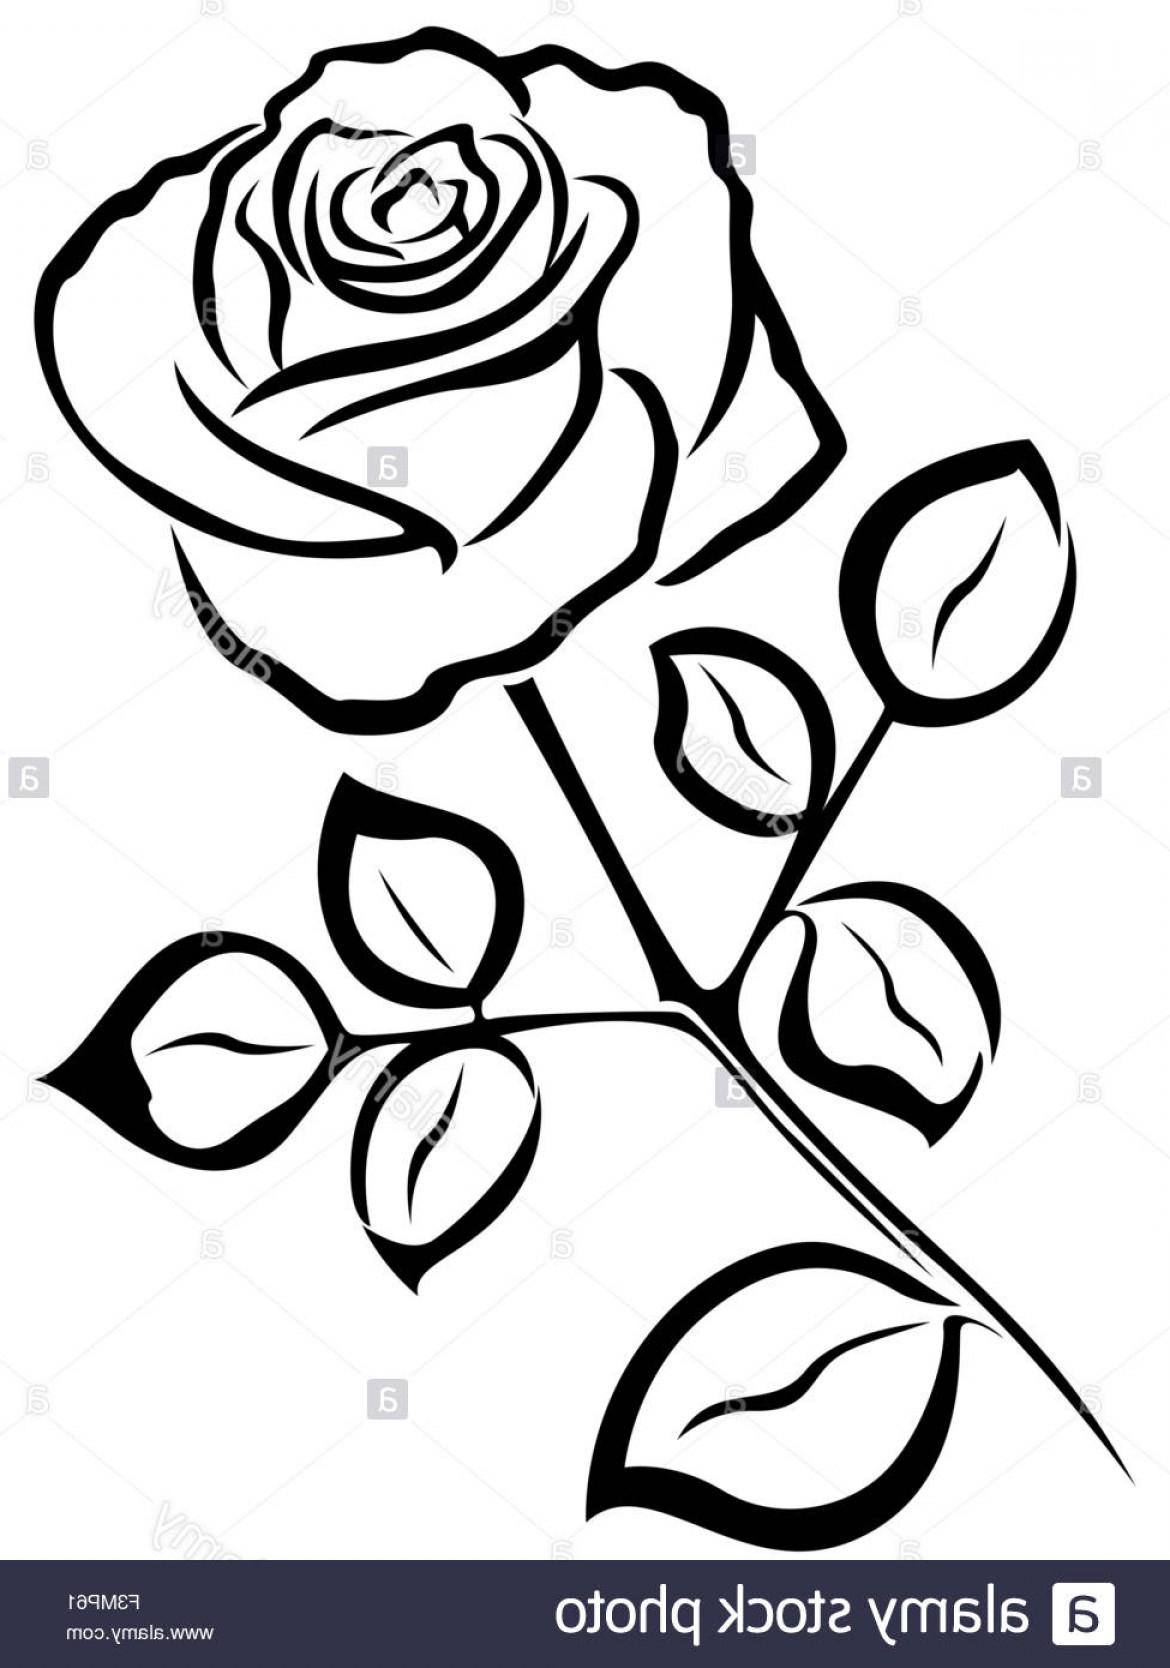 1170x1668 Rose Flower Outline Drawing Free Outline Flower Vector Design